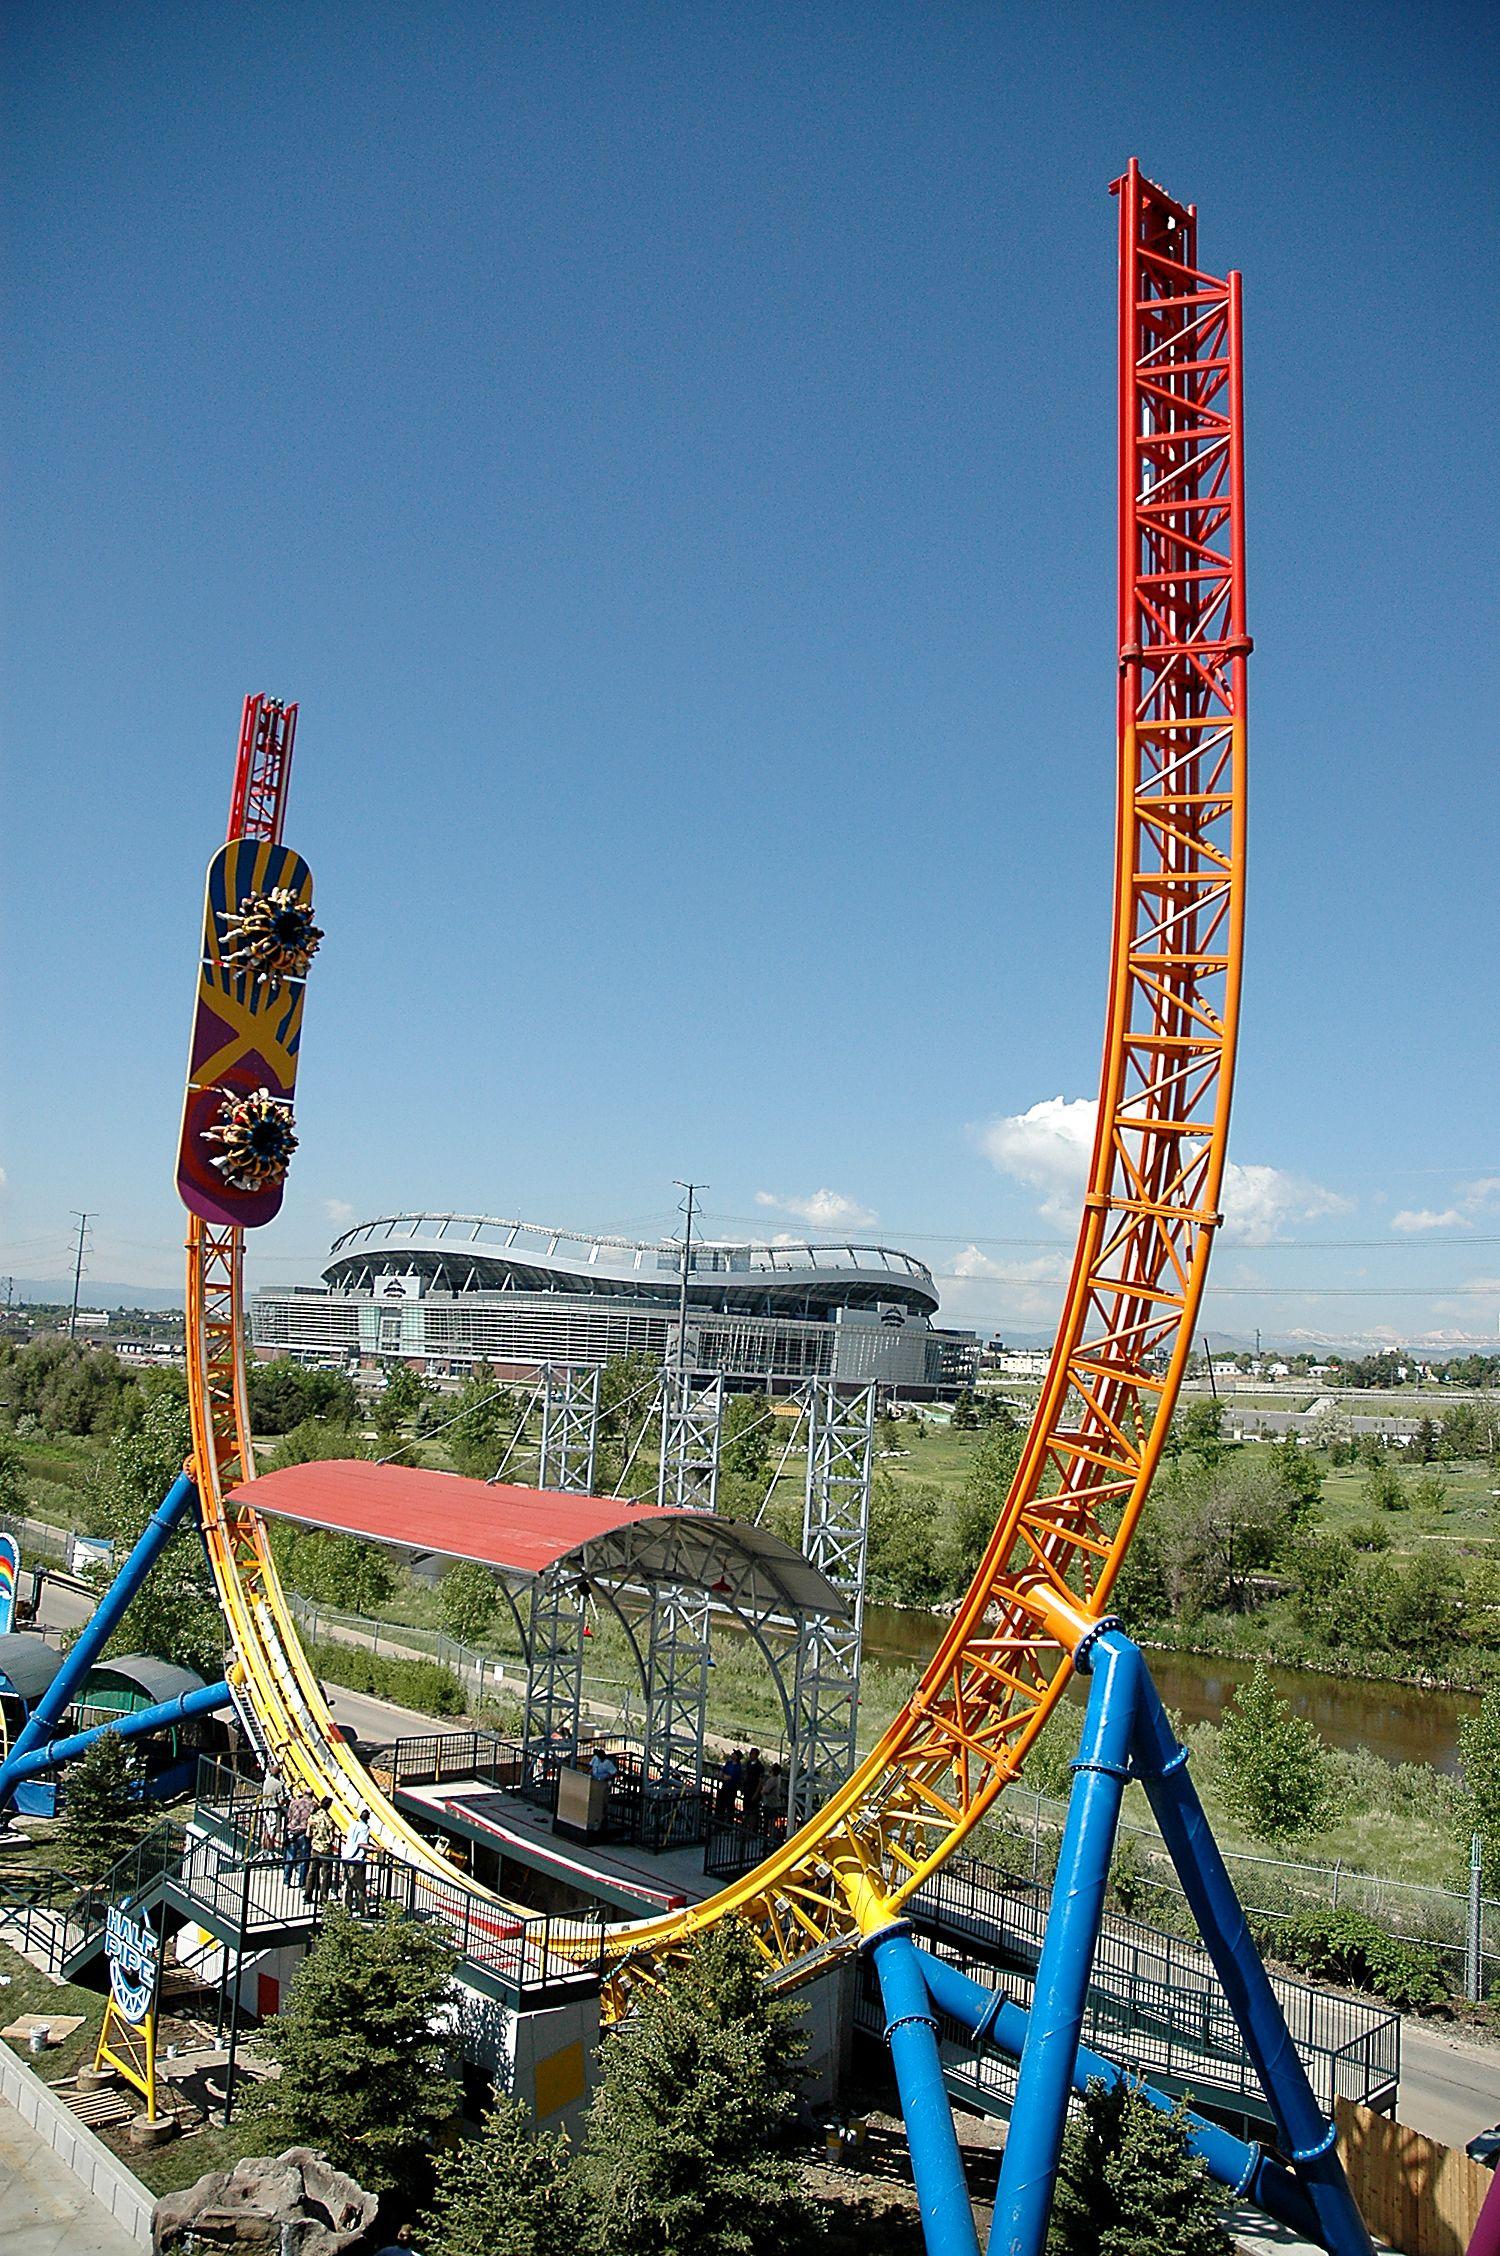 Ride . Walt Disney Studious